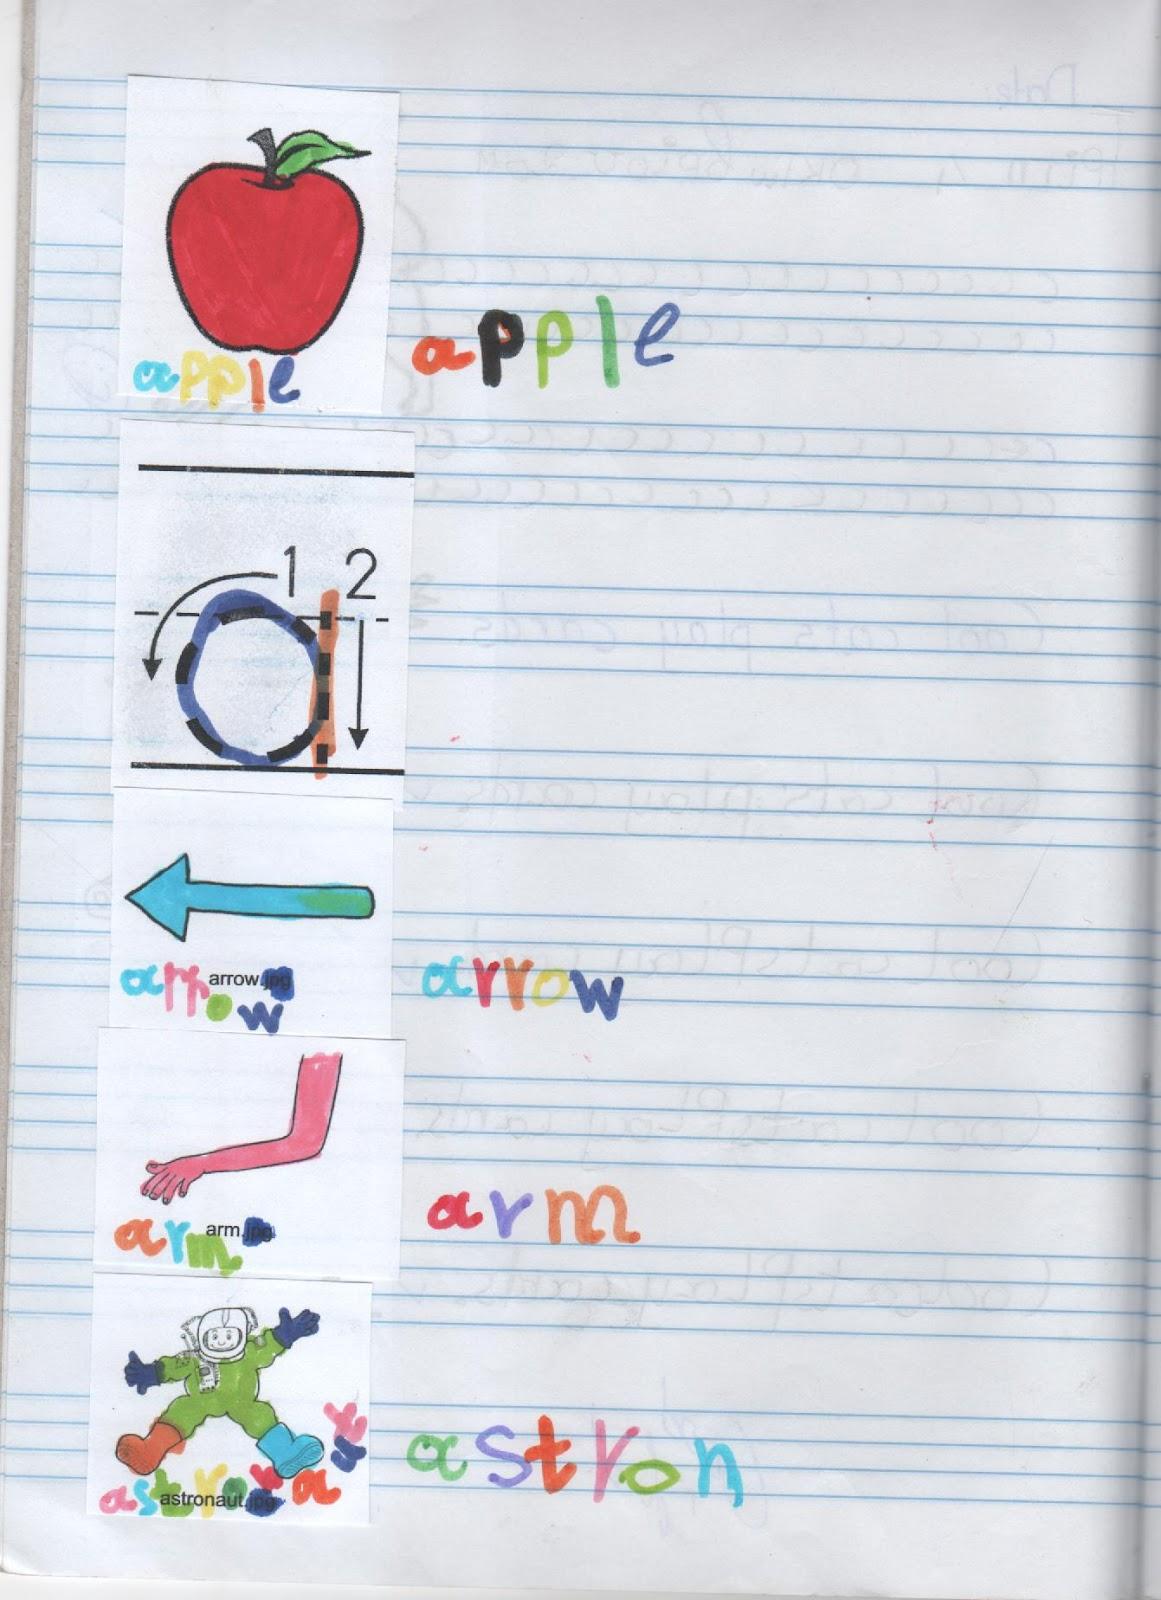 I Teacher April